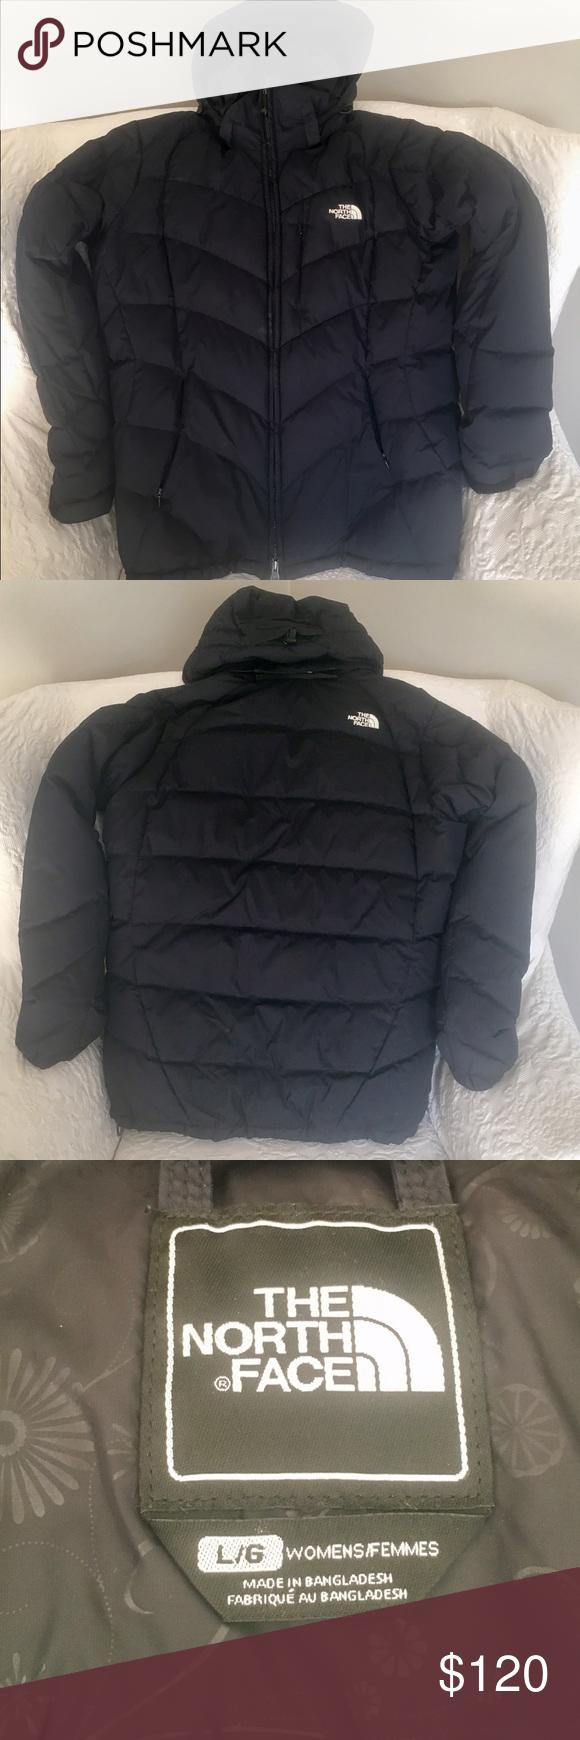 Host Pick Lowest Price North Face Women S Coat North Face Womens Coat North Face Women Puffer Jacket Women [ 1740 x 580 Pixel ]